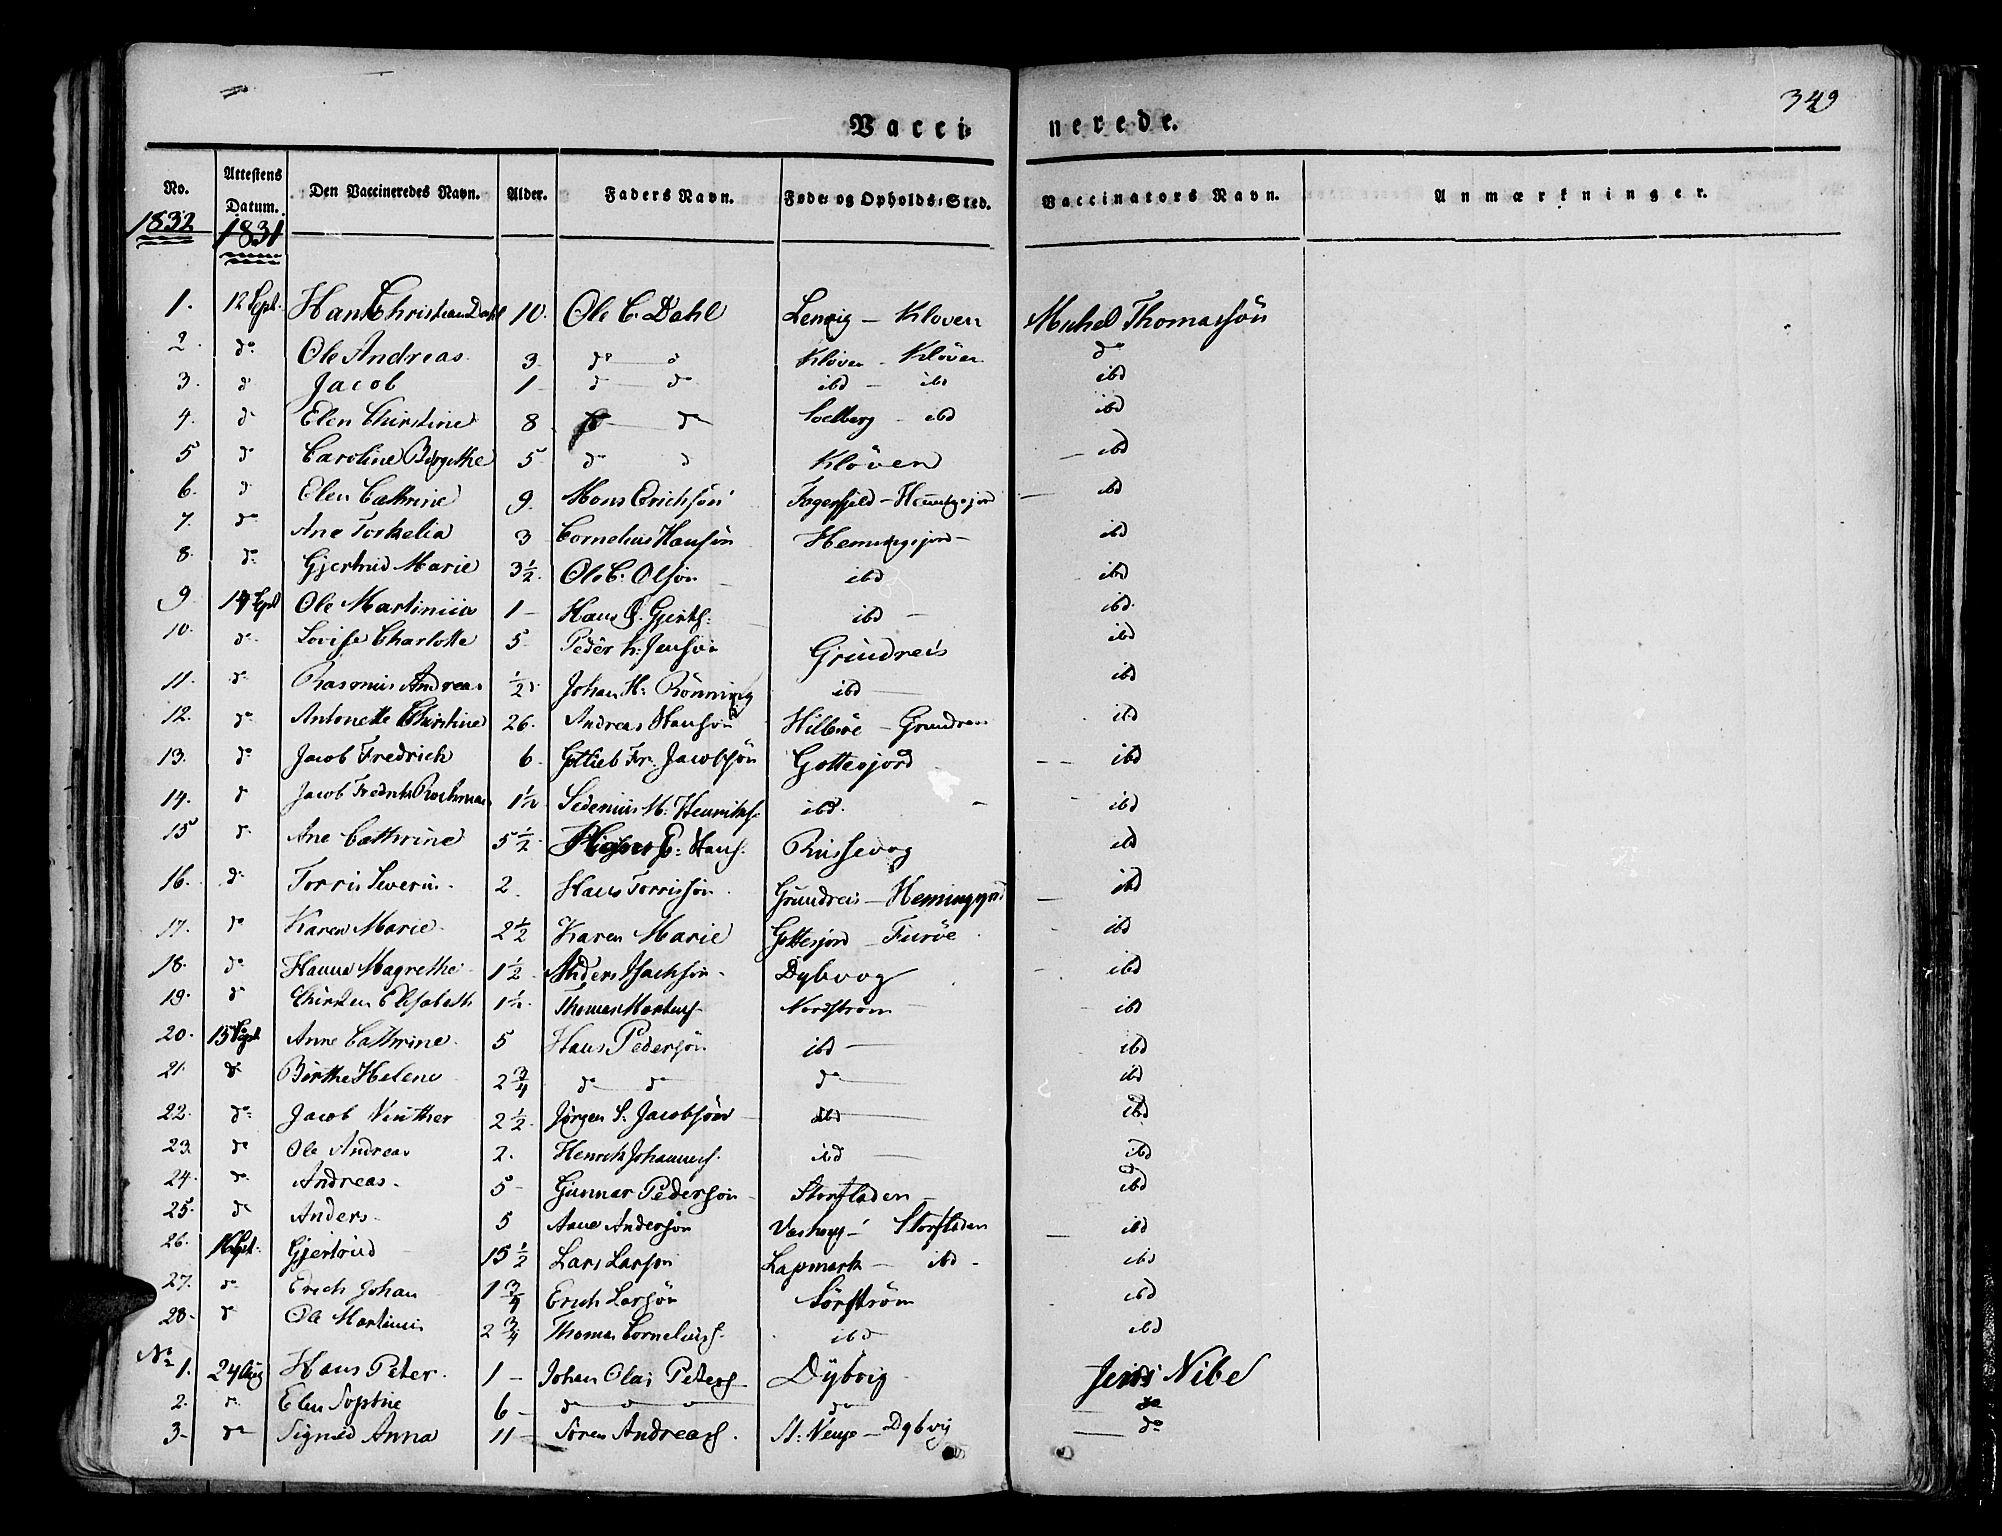 SATØ, Tranøy sokneprestkontor, I/Ia/Iaa/L0005kirke: Ministerialbok nr. 5, 1829-1844, s. 349